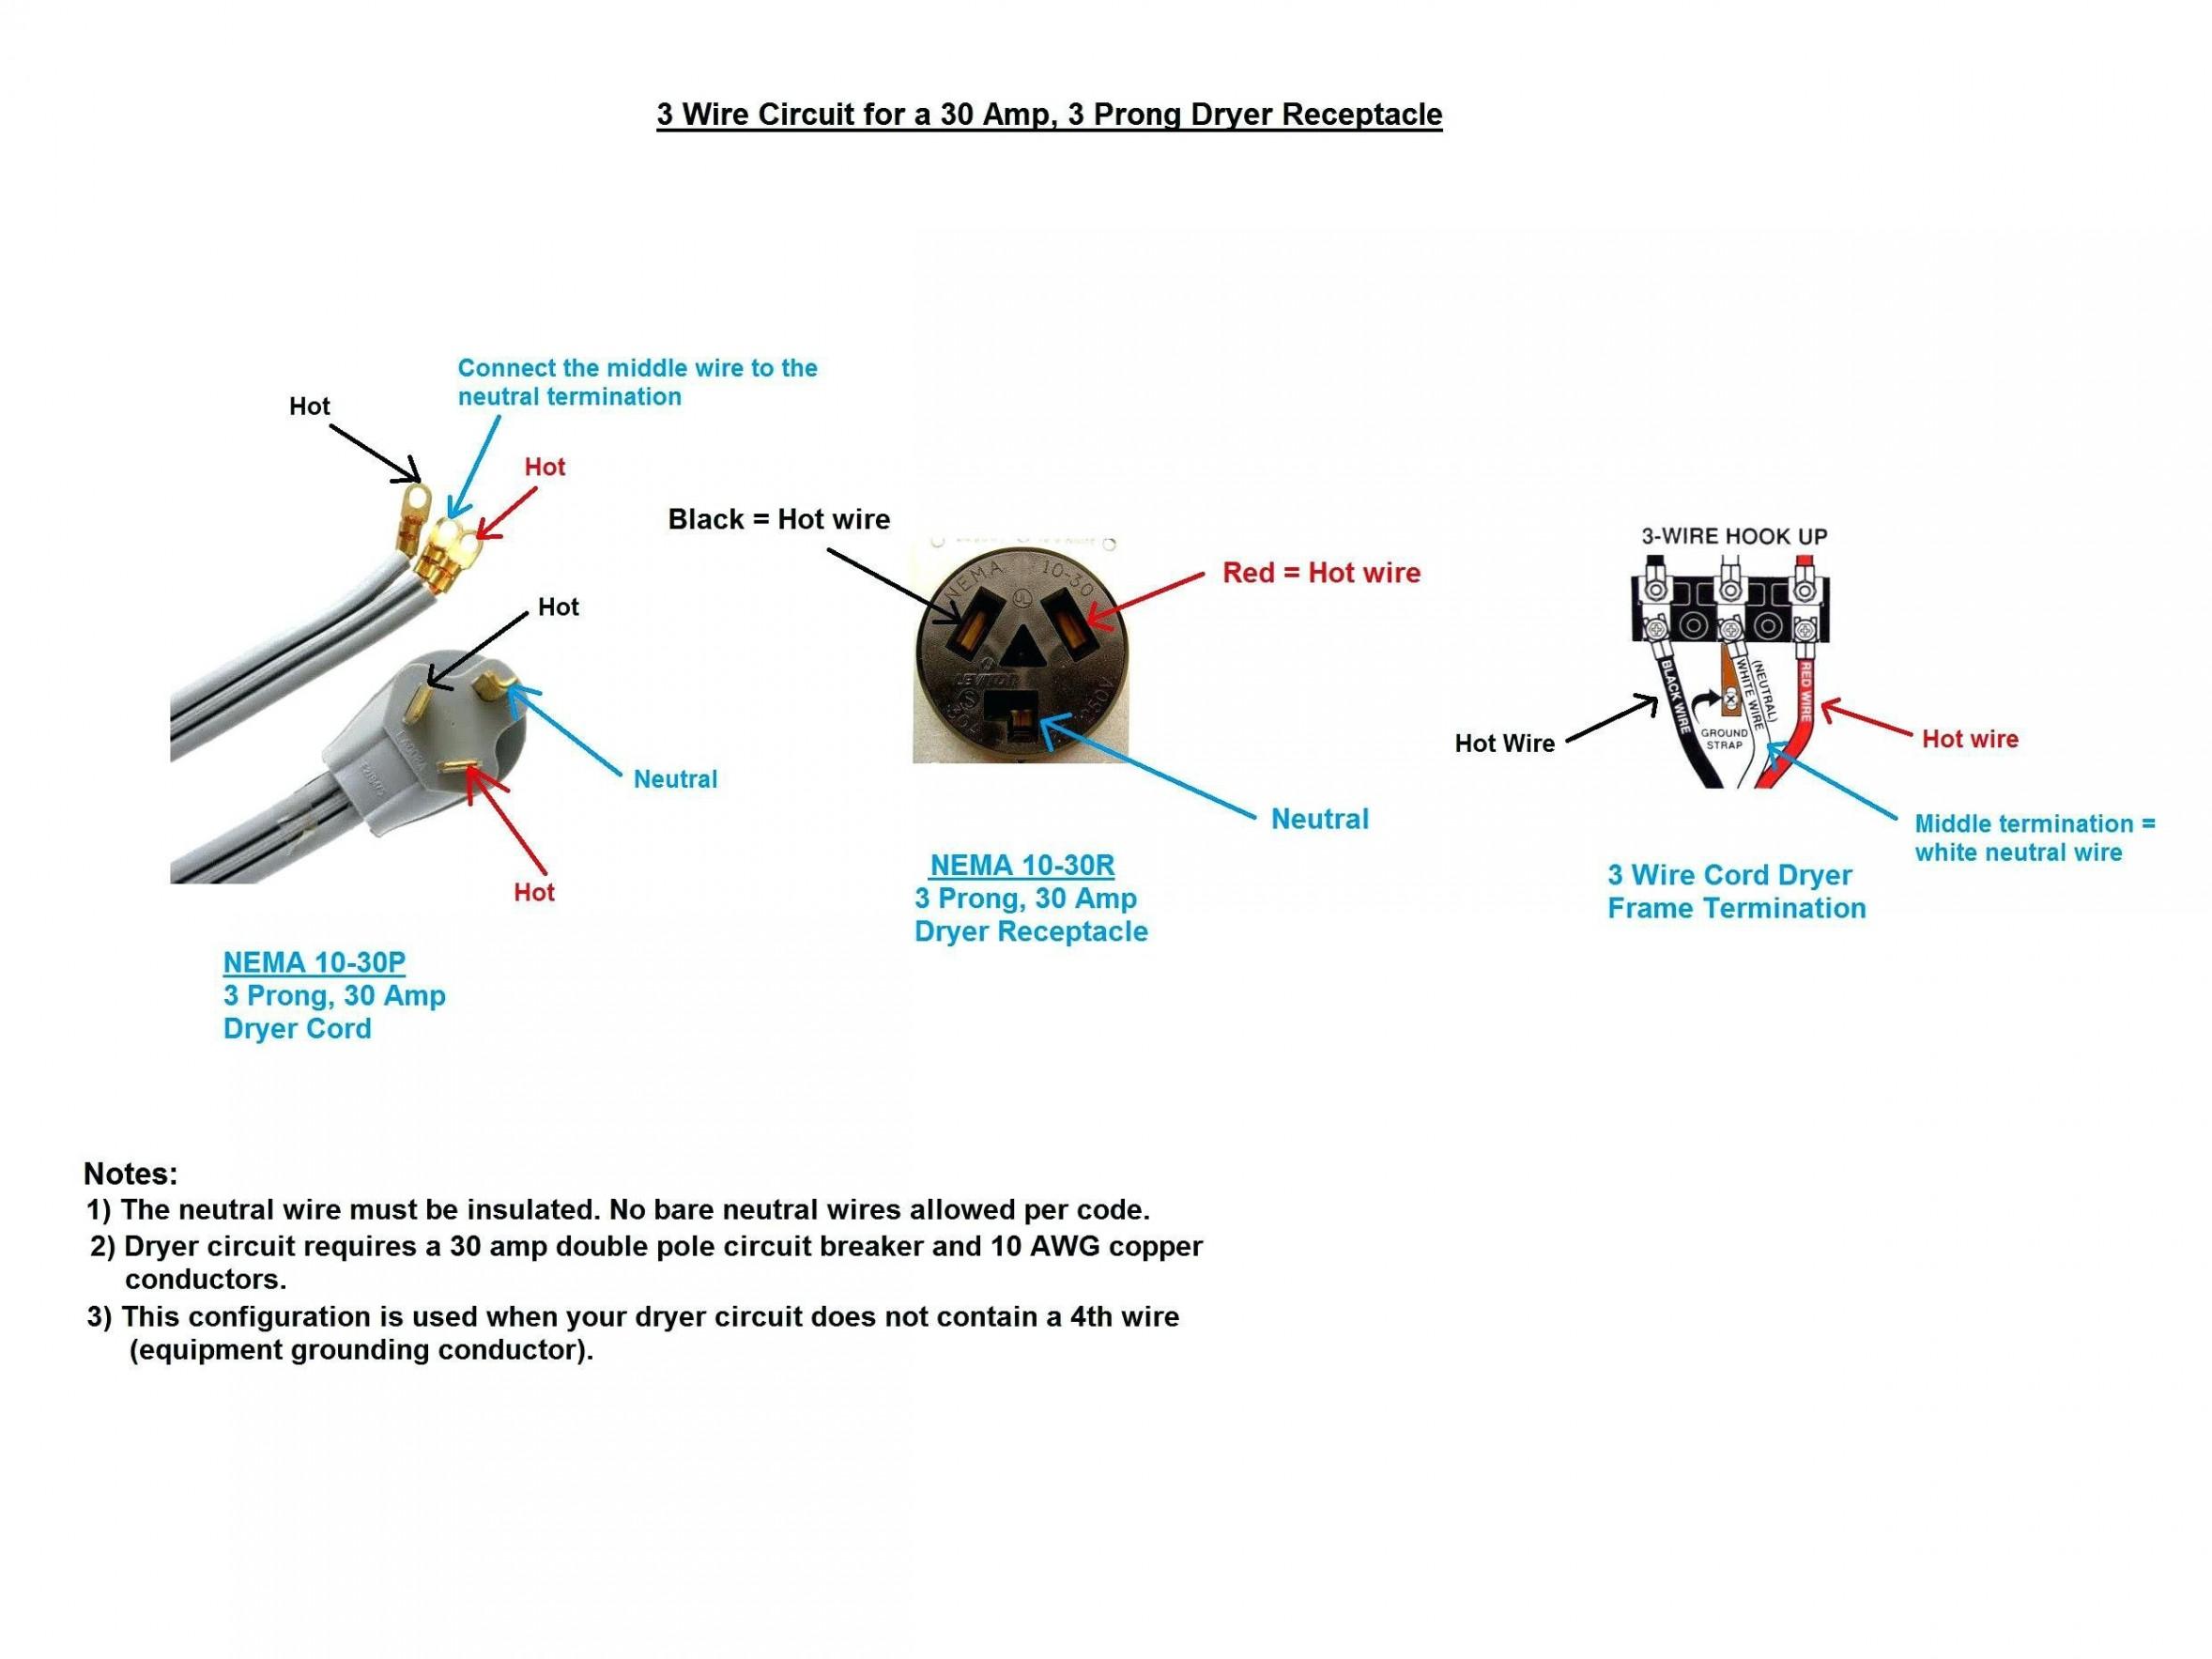 VX_8668] 240 Dryer Wiring Diagrams Schematic WiringSocad Ifica Unho Kapemie Mohammedshrine Librar Wiring 101